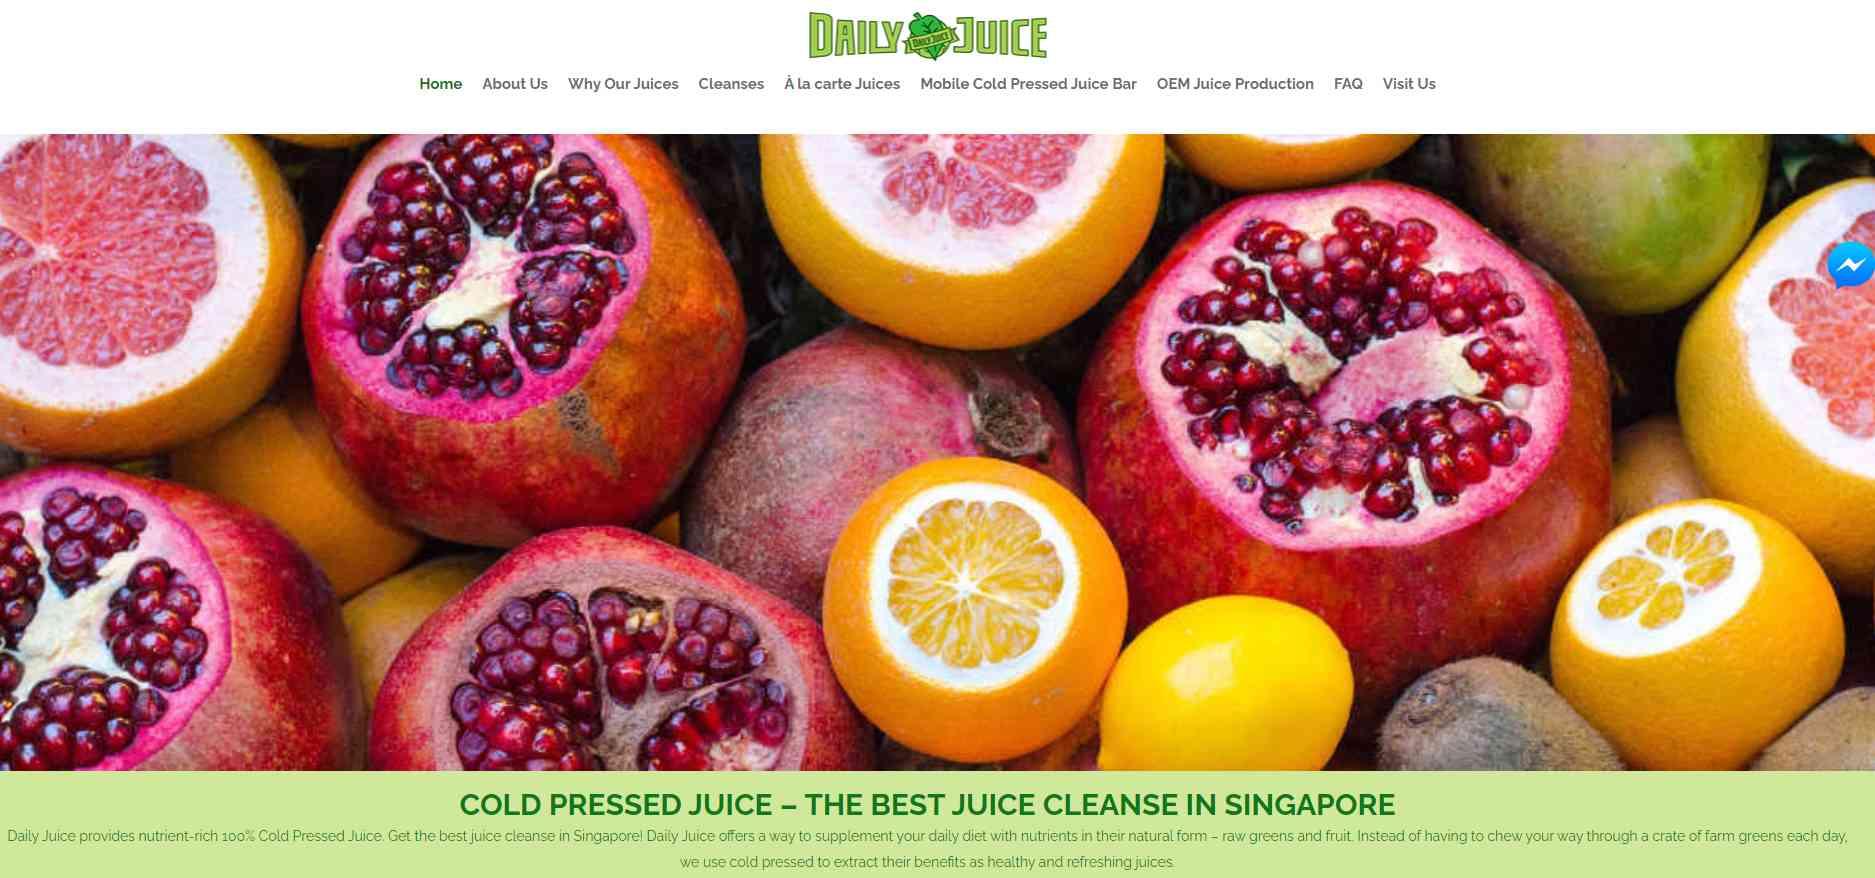 daily juice Top Juice Retailers in Singapore